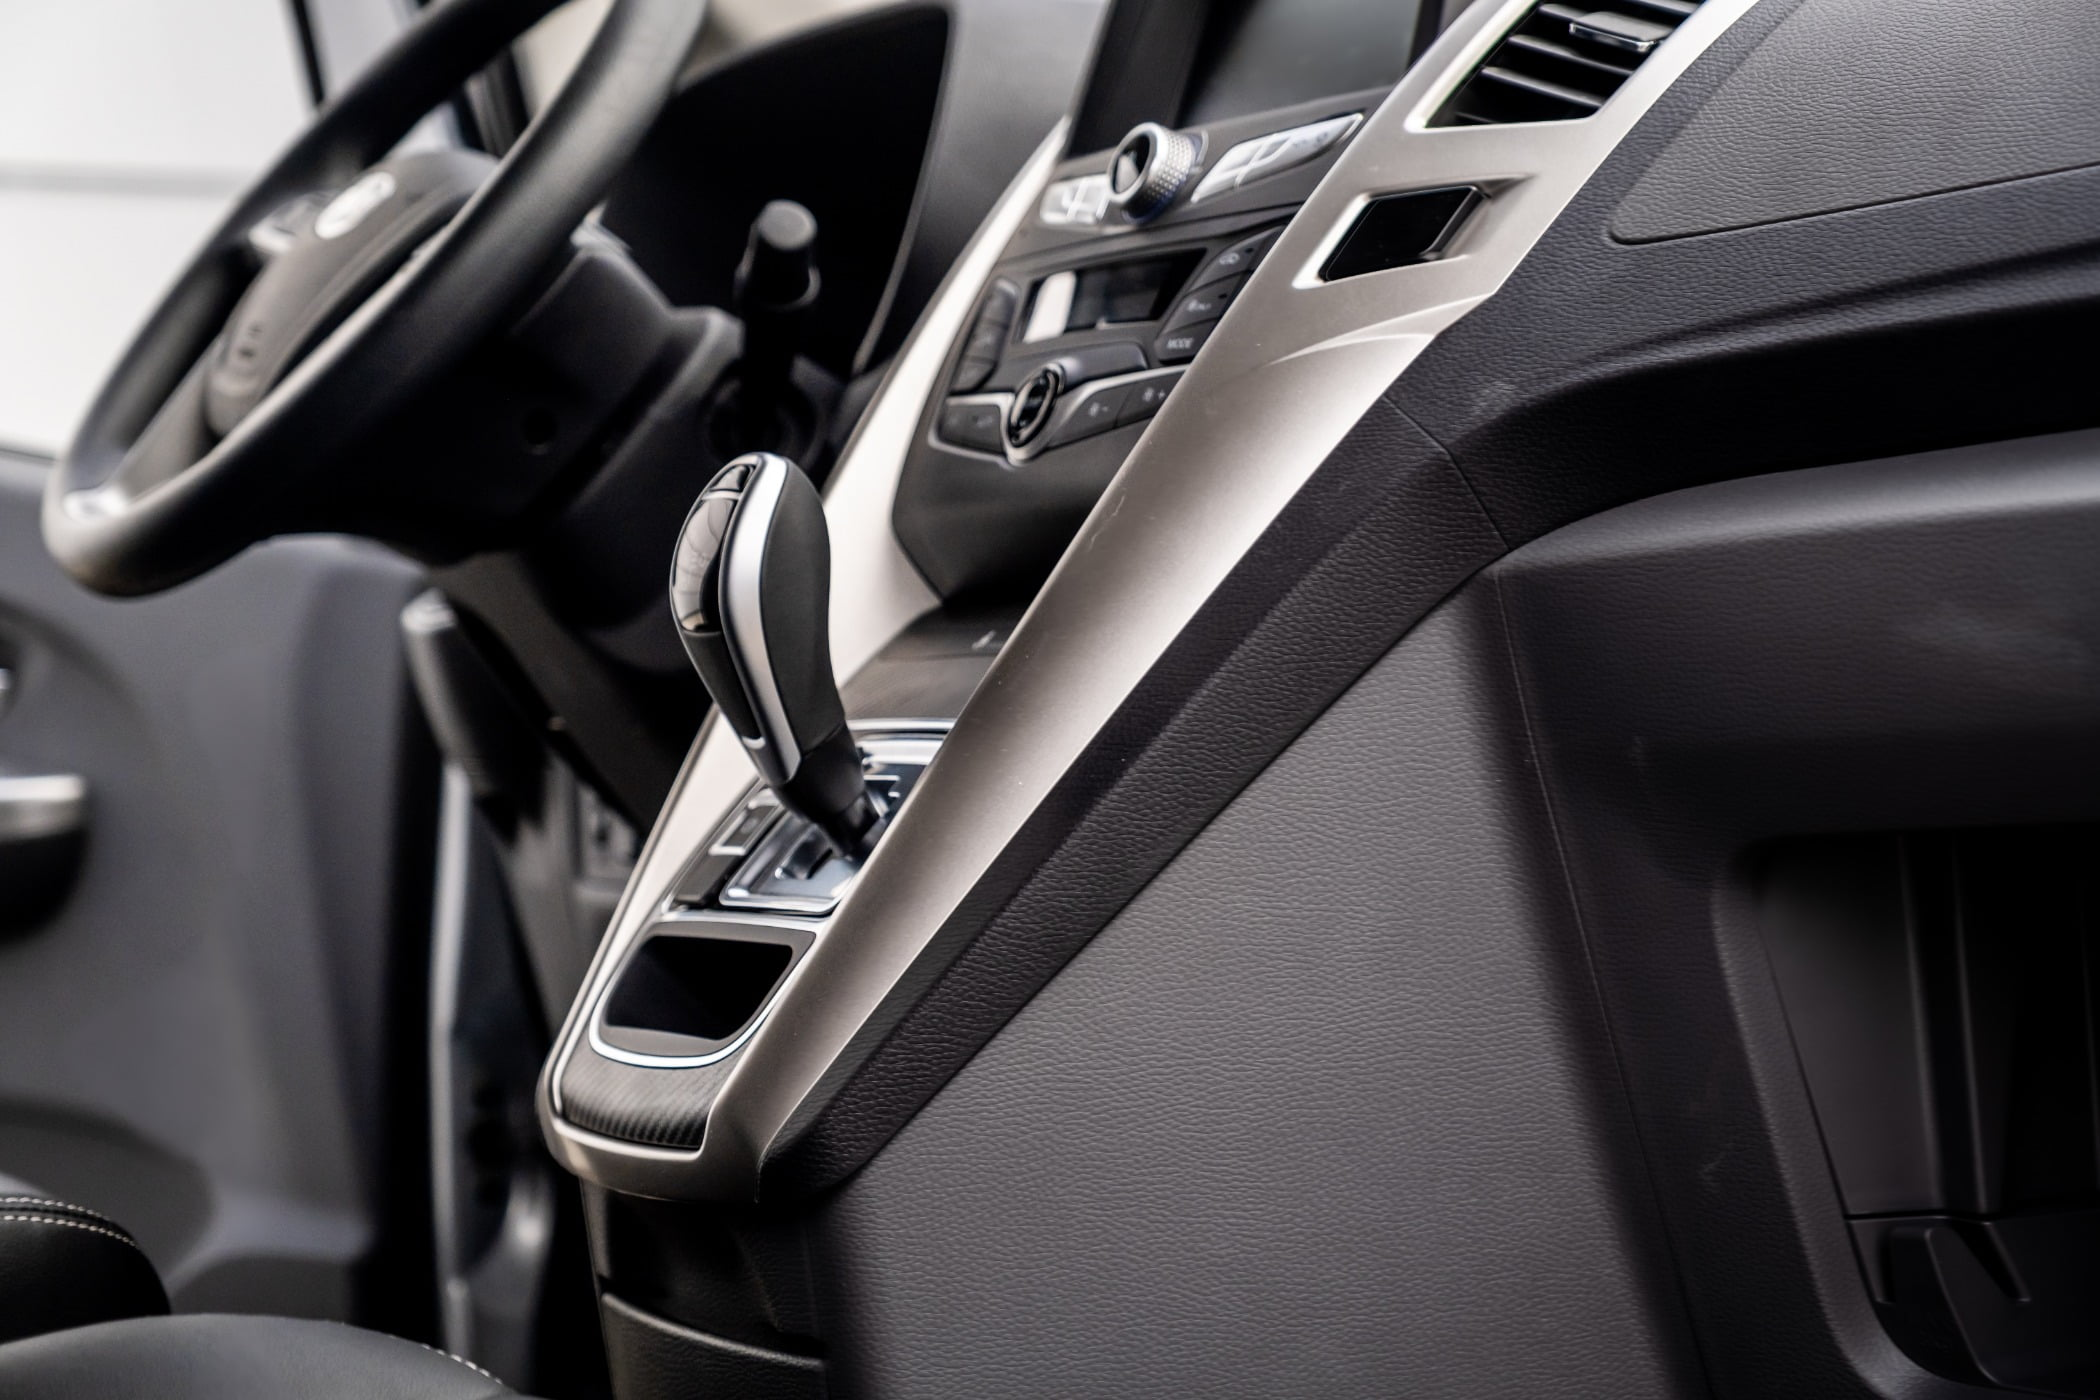 Personal luxury car, Motor vehicle, Gear shift, Automotive design, Steering part, Rim